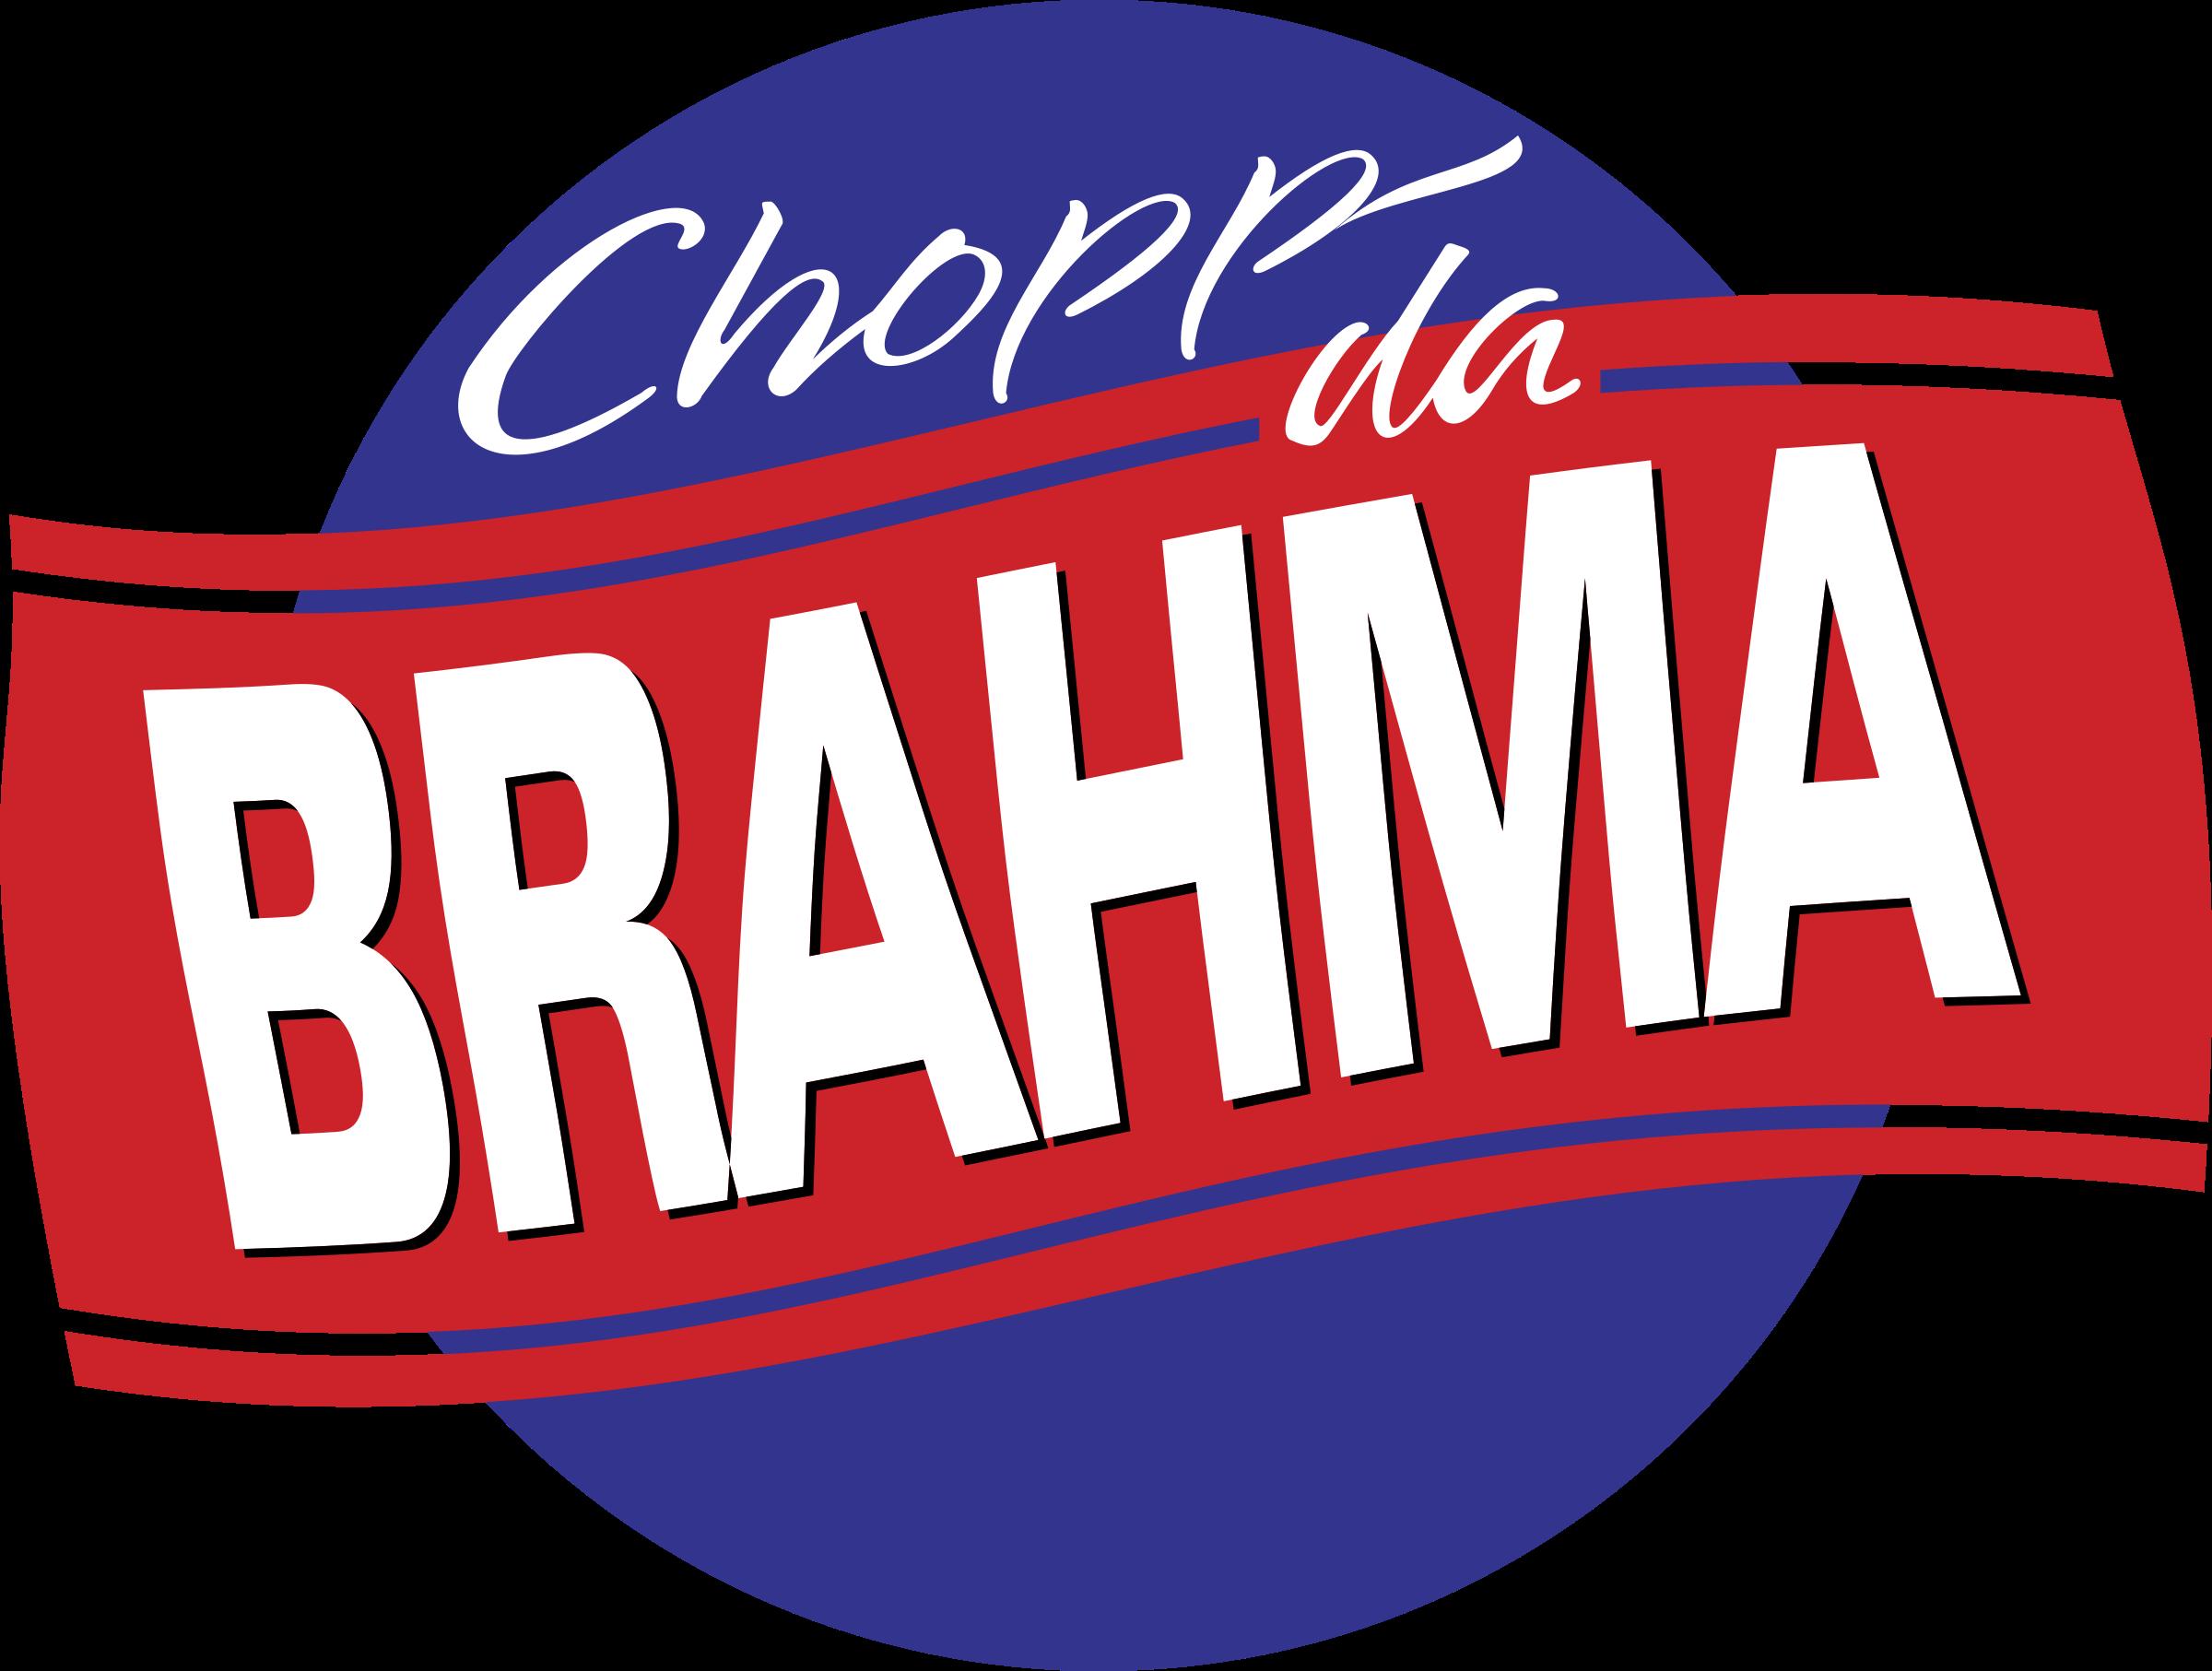 brahma copo Logo PNG Transparent & SVG Vector.